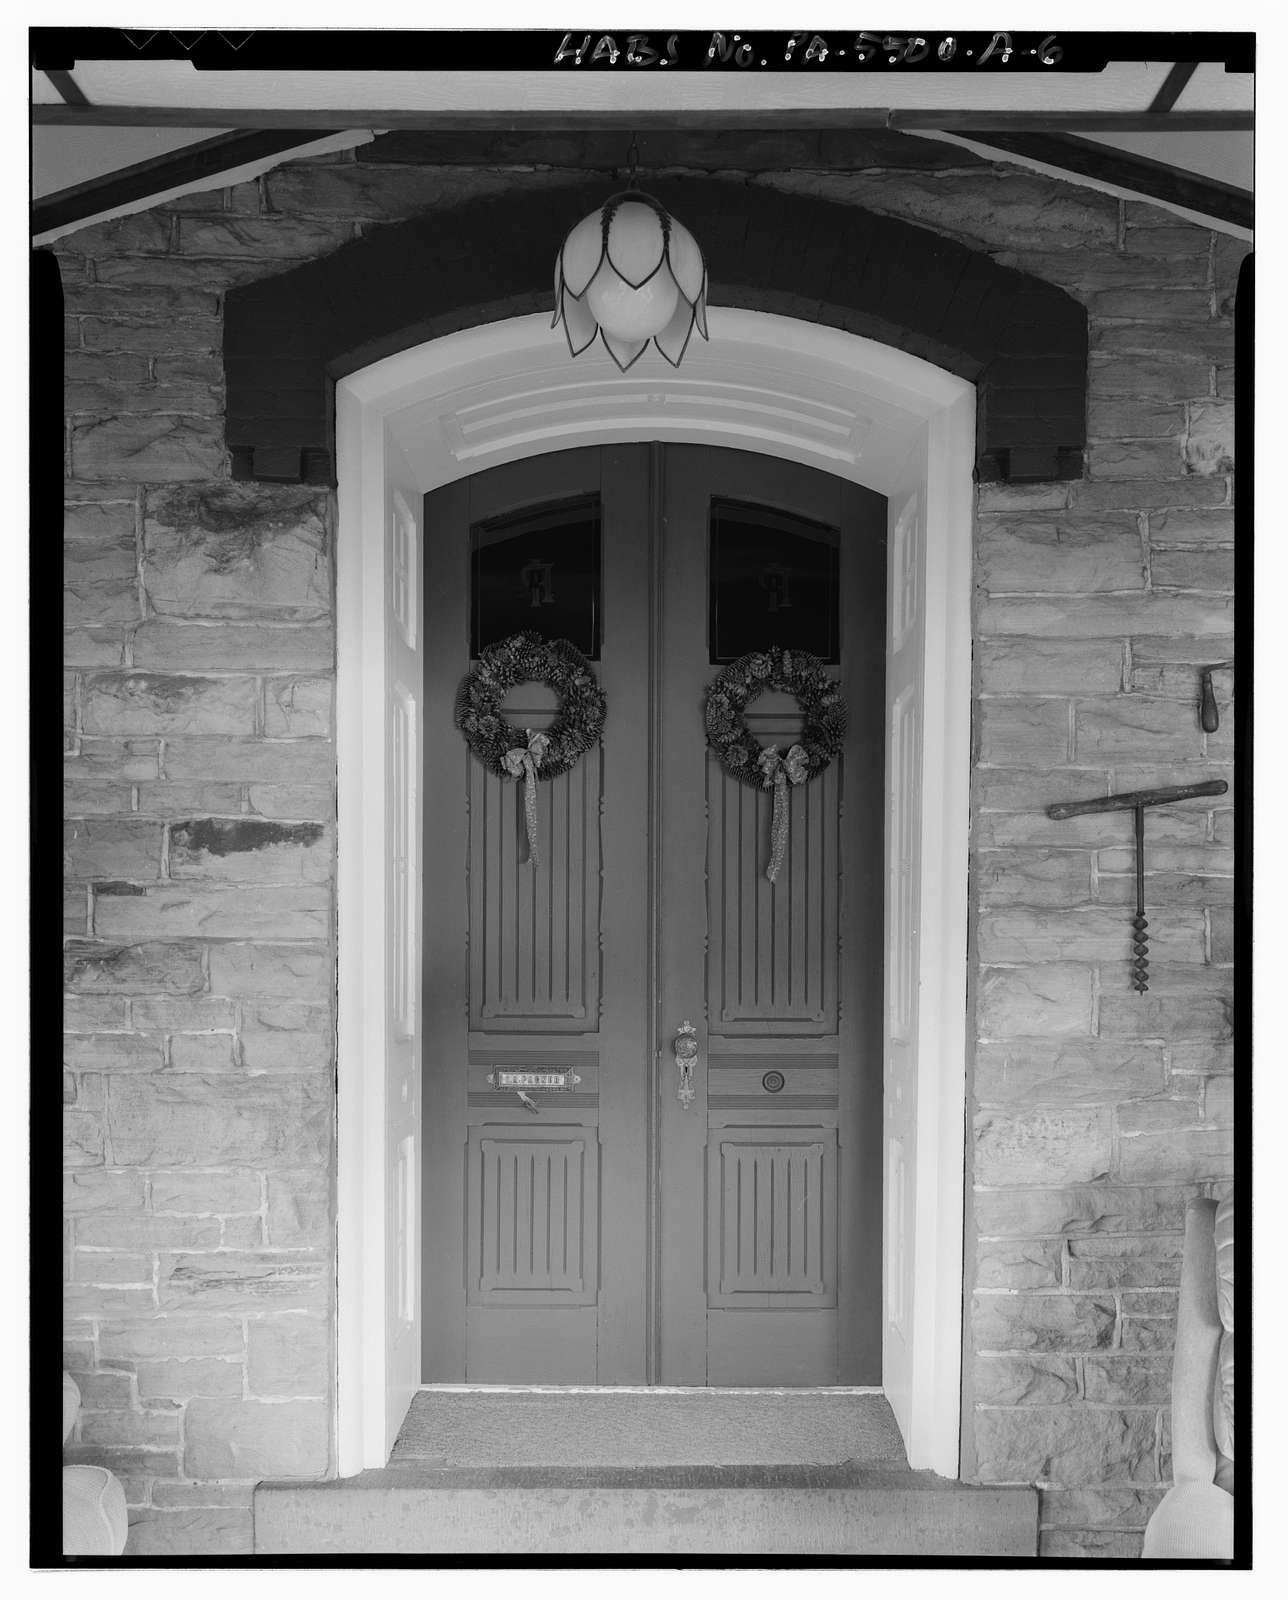 Isaac A. Packer Farm, Farm House, Legislative Route 18011, 2.4 miles northwest of Jay Street Bridge (Farrandsville Road), Lock Haven, Clinton County, PA